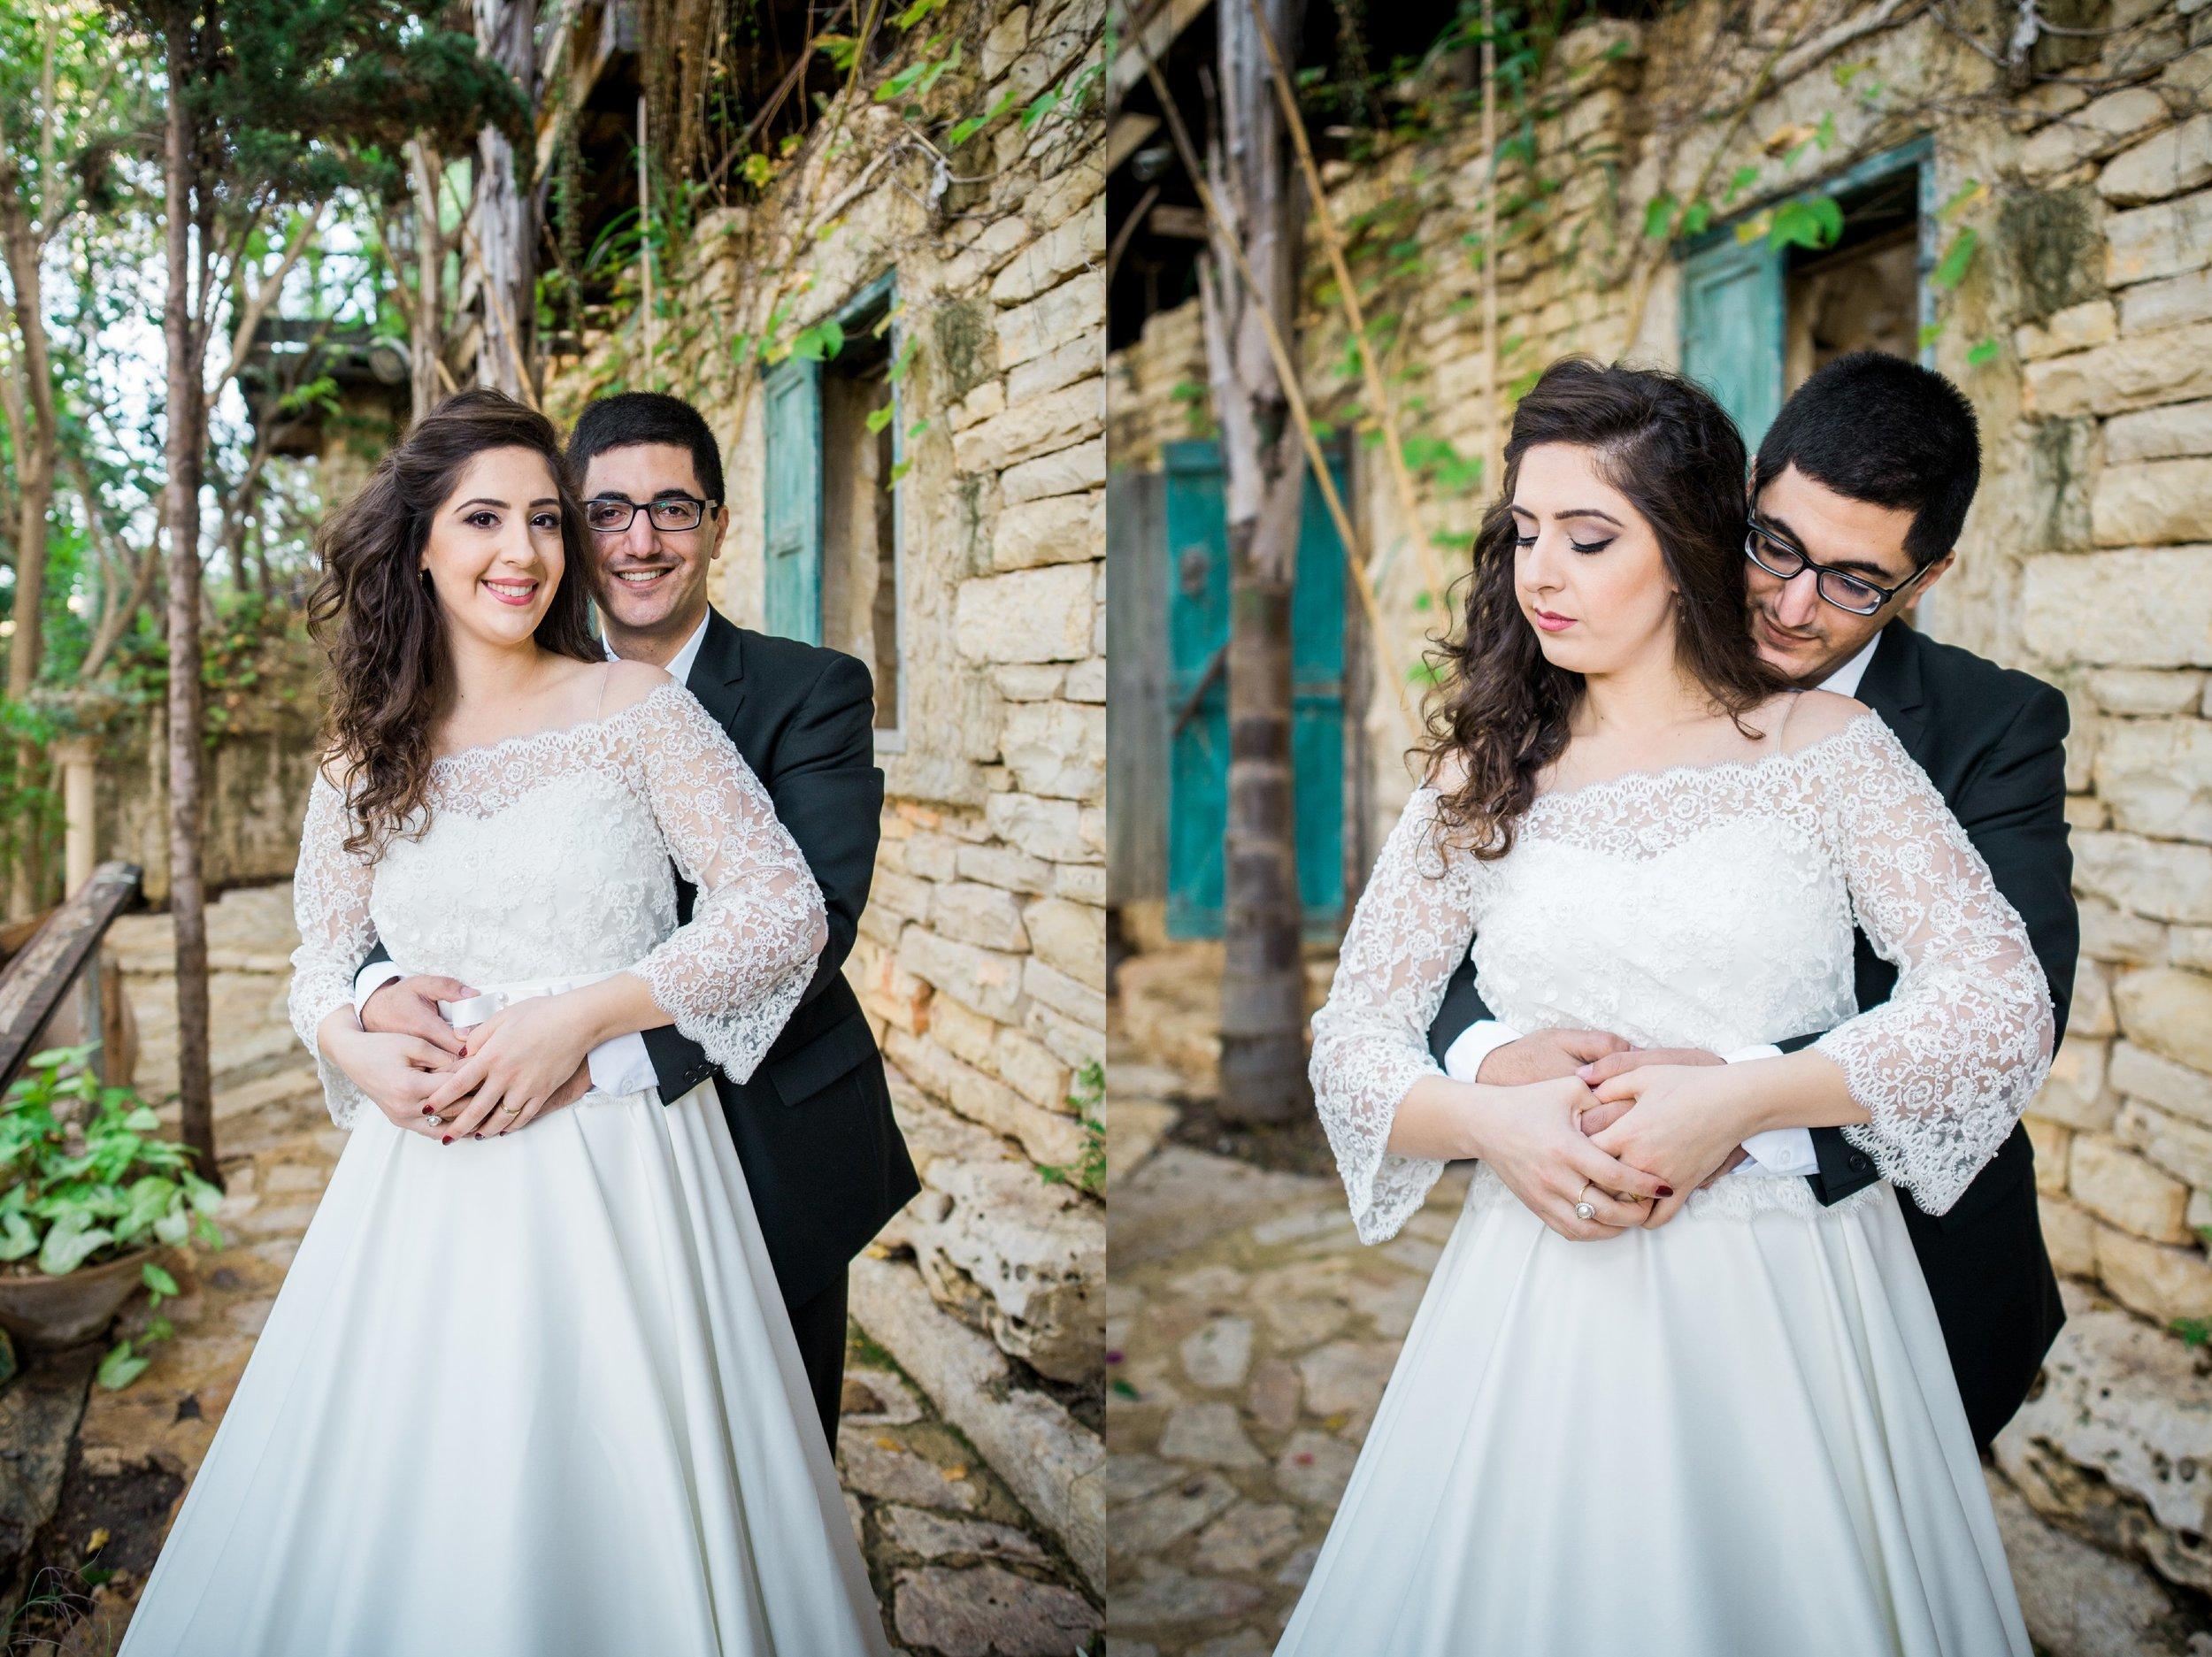 israel-garden-wedding-portraits-session-kate-giryes-photography--19_WEB.jpg